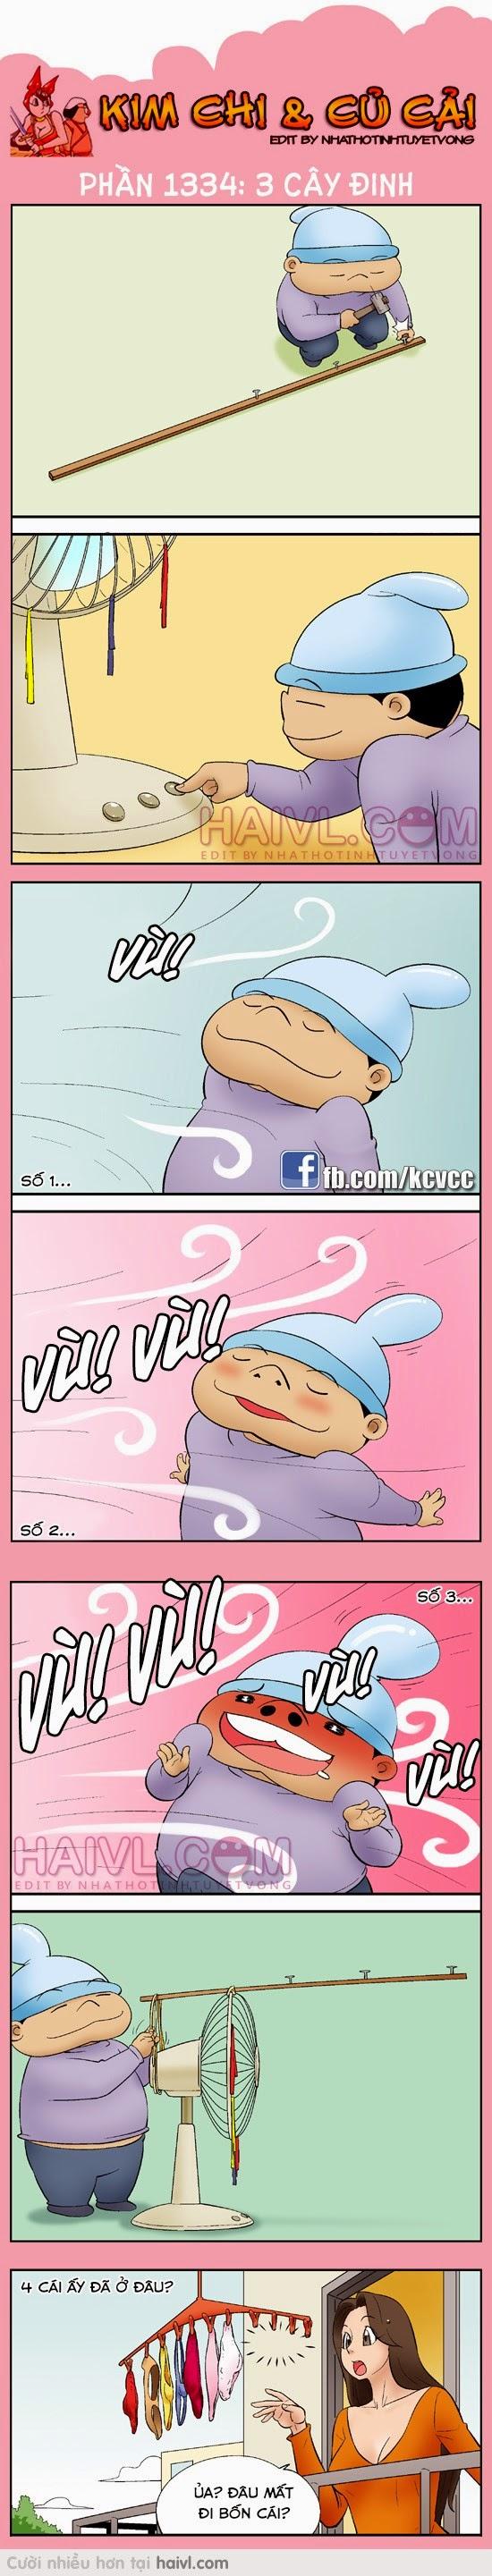 Truyen Tranh hai Han Quoc Kim Chi va Cu Cai